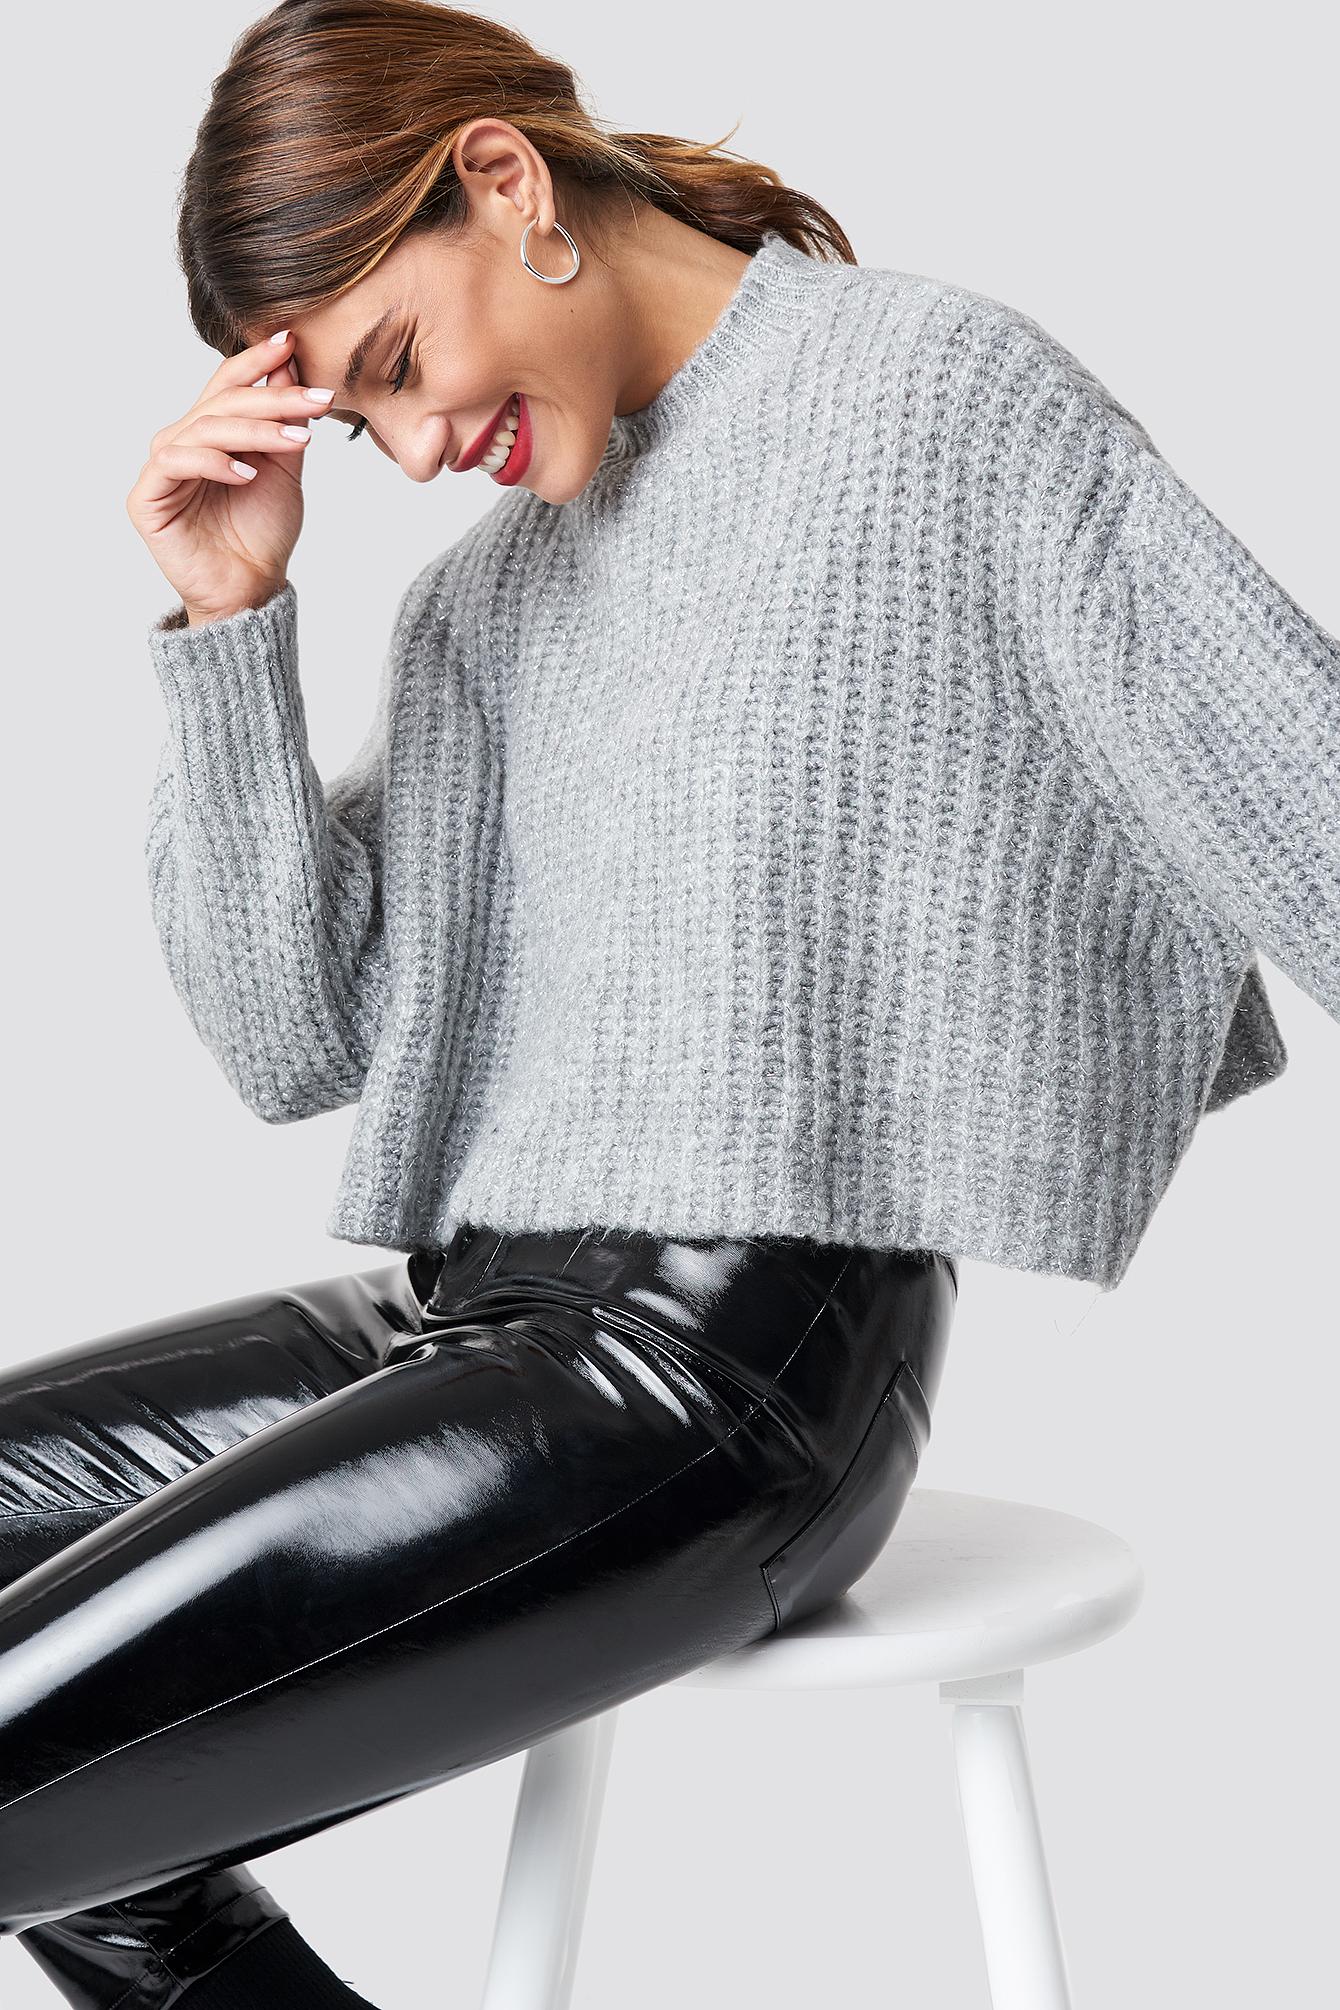 trendyol -  Round Glittery Neck Short Knitted Jumper - Grey